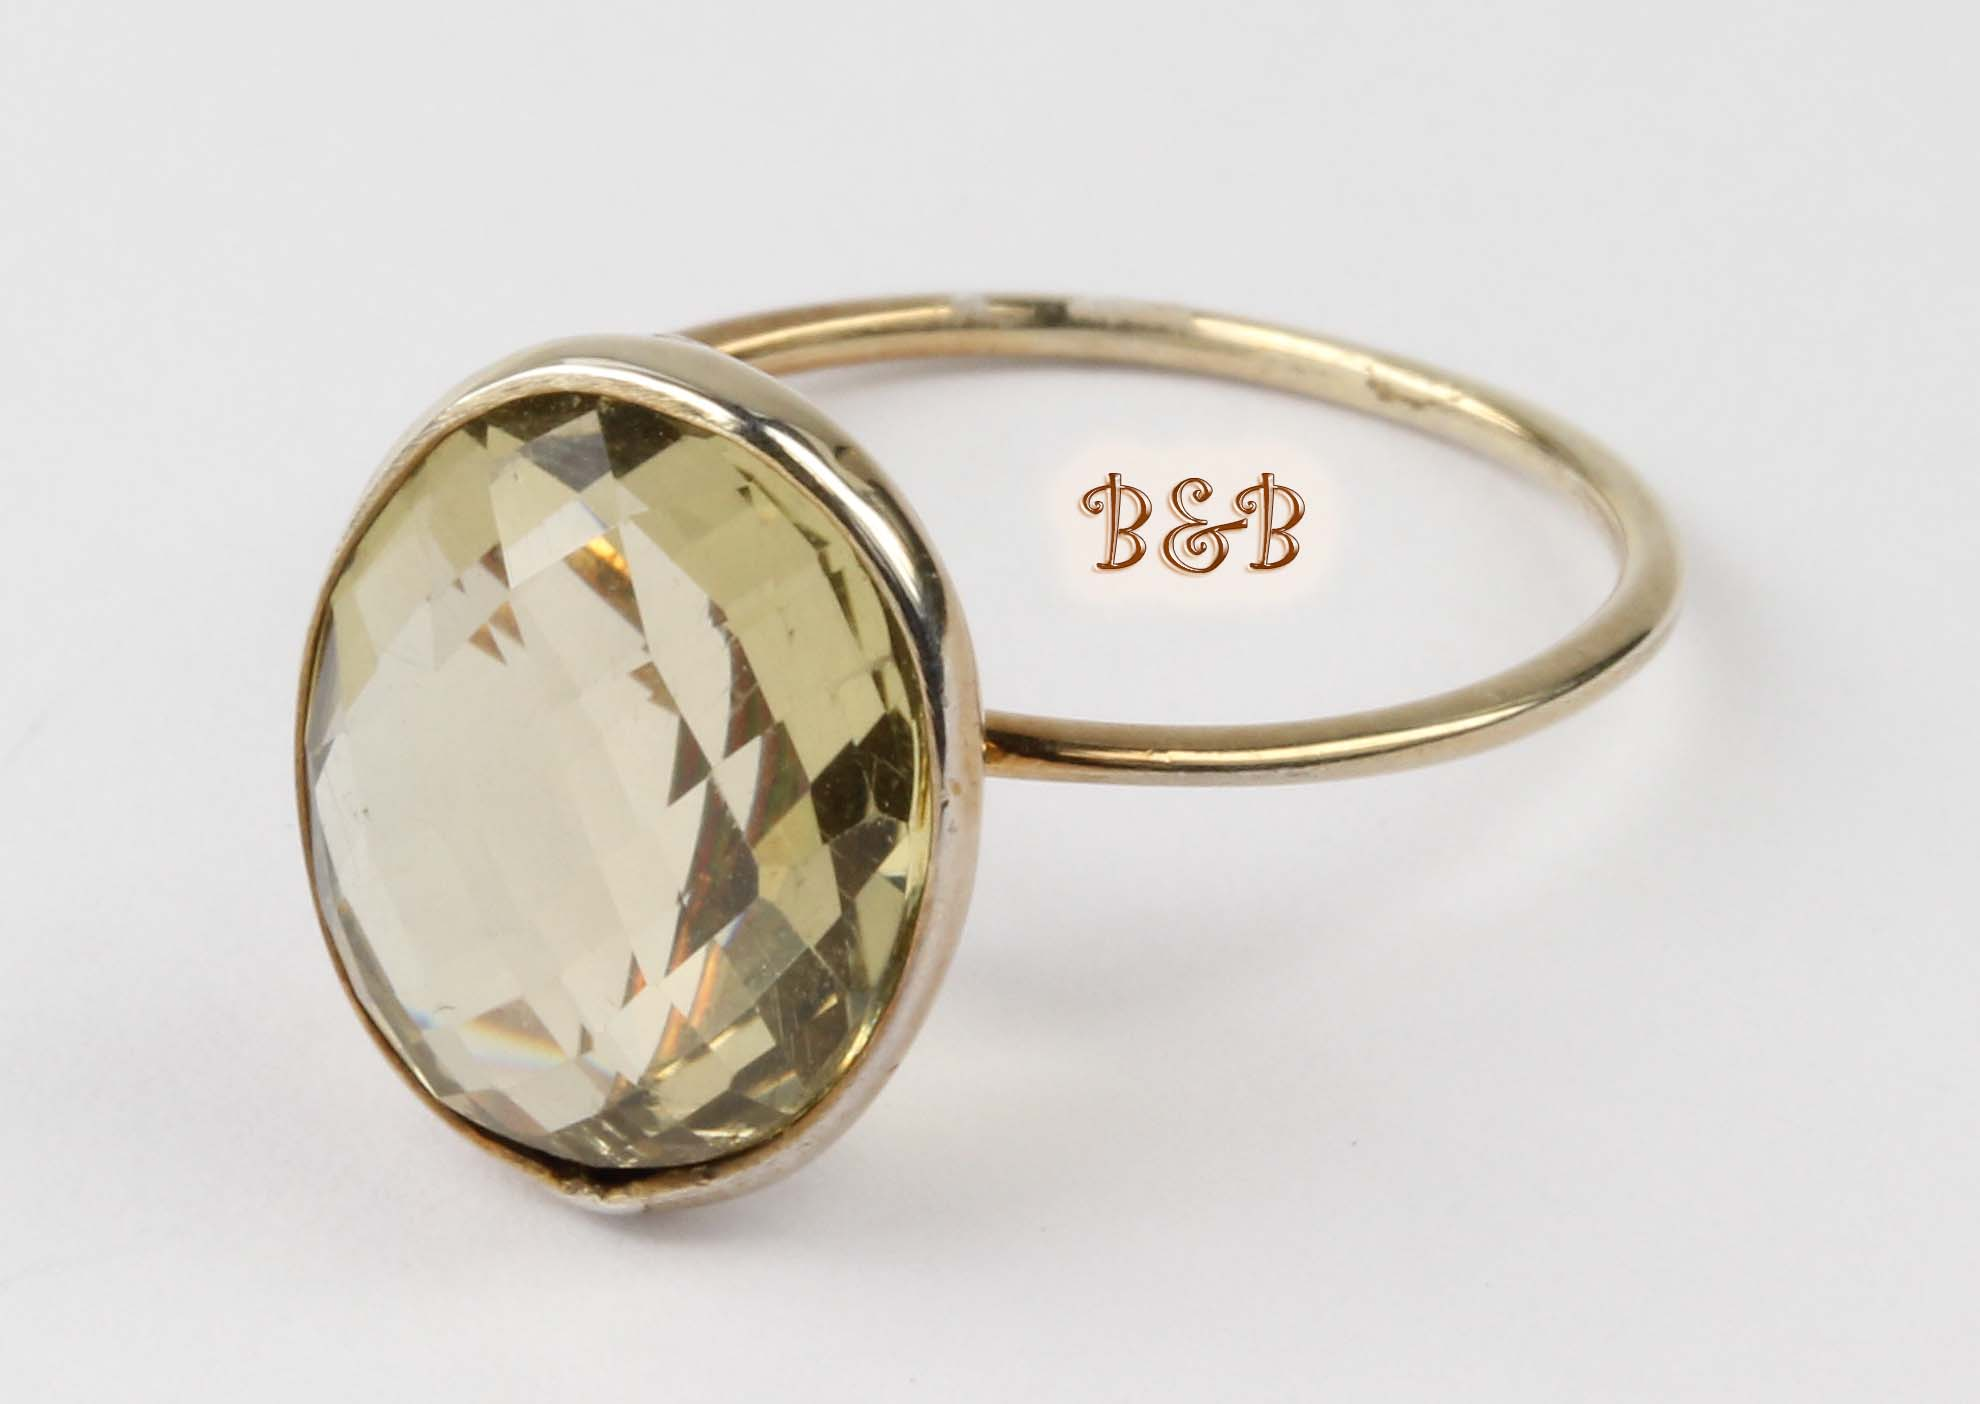 Silver ring_B&B_1720